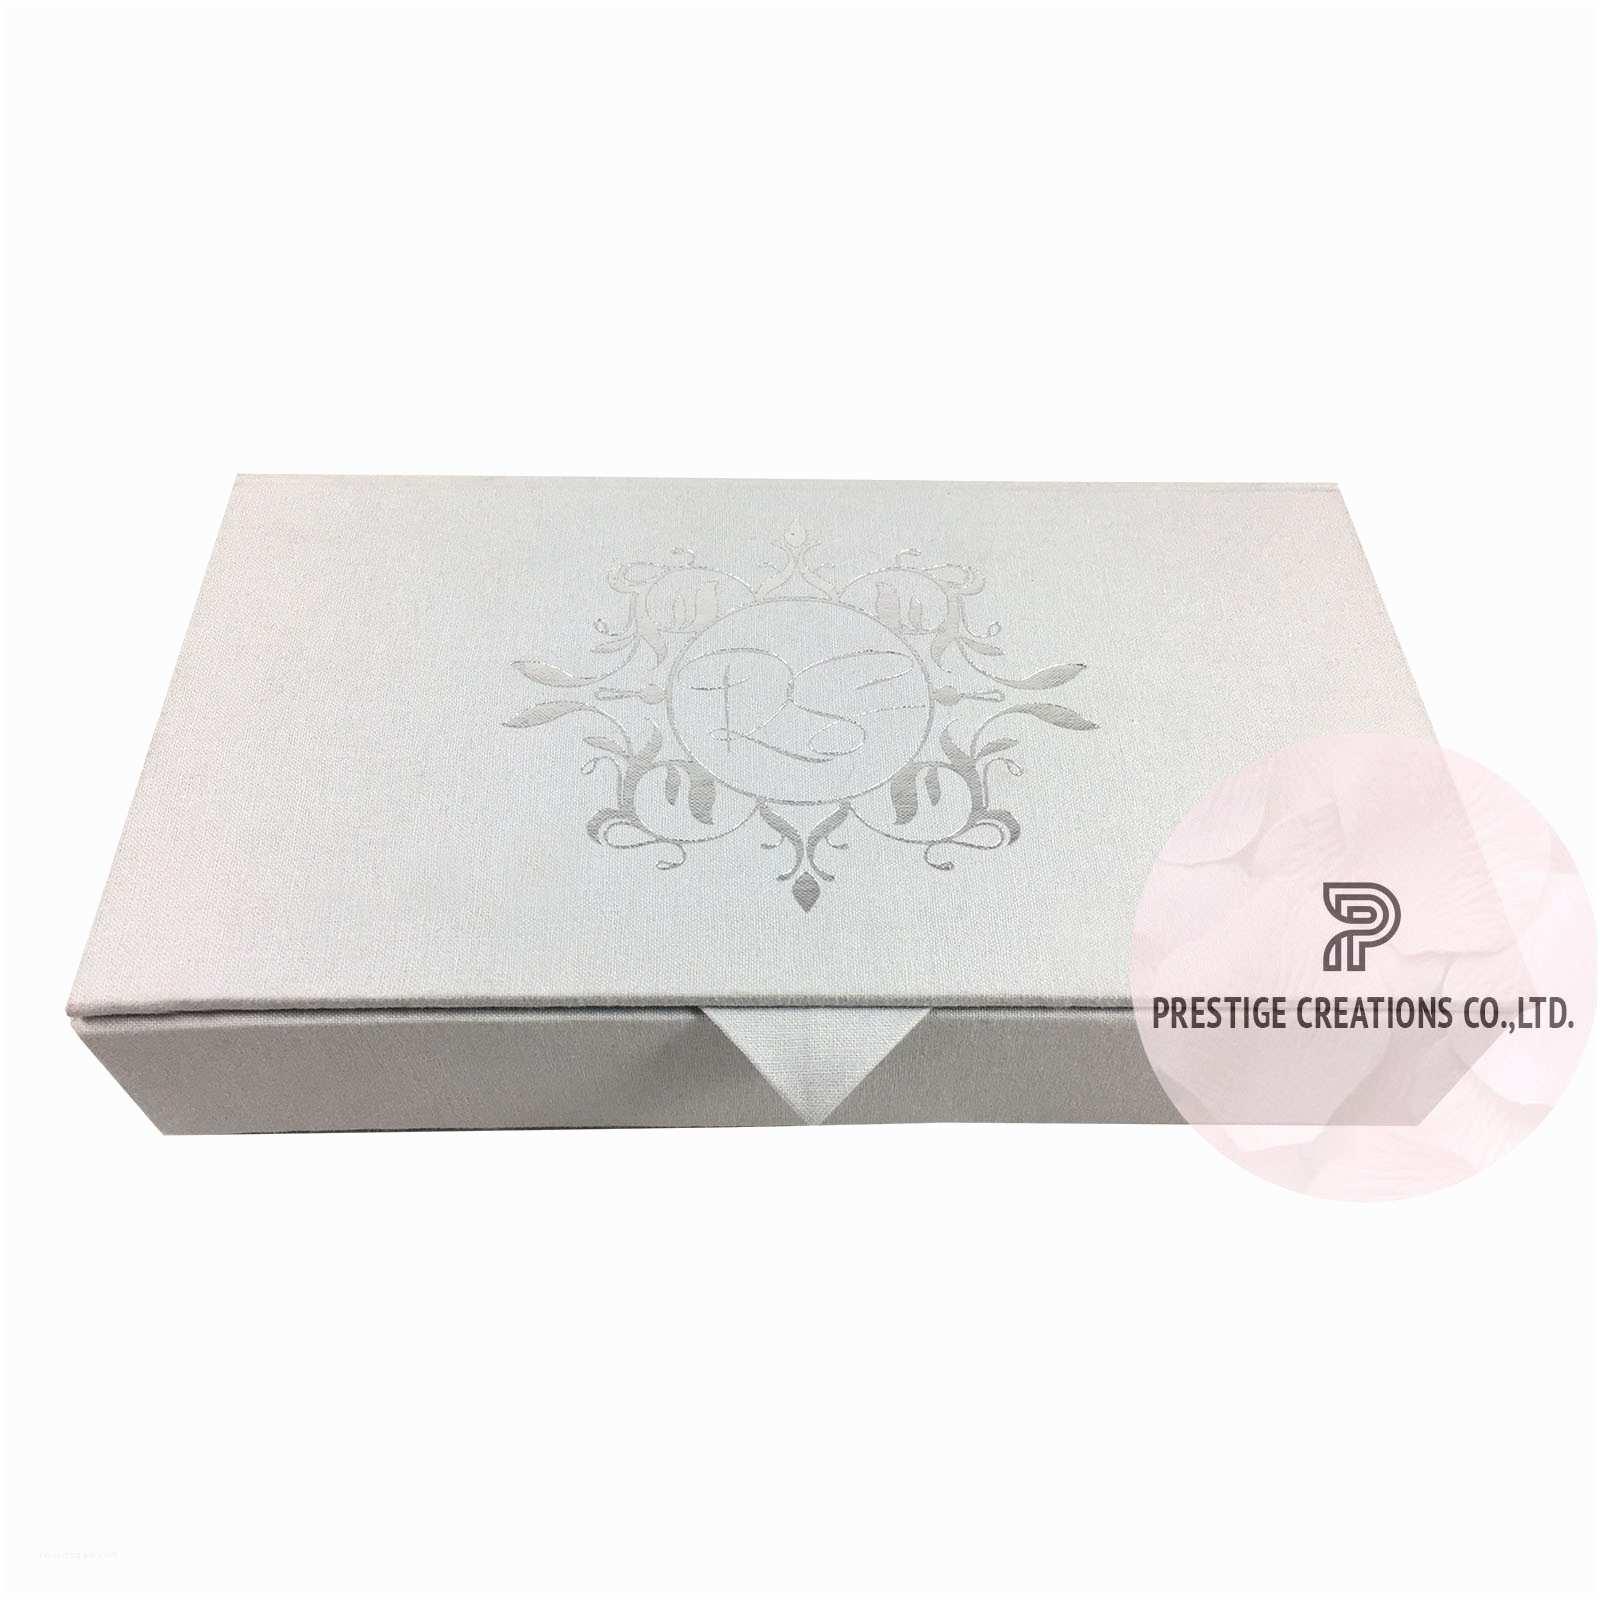 Wedding Invitation Boxes Cheap Silver Foil Wedding Invitations & Monogram Foil Stamped